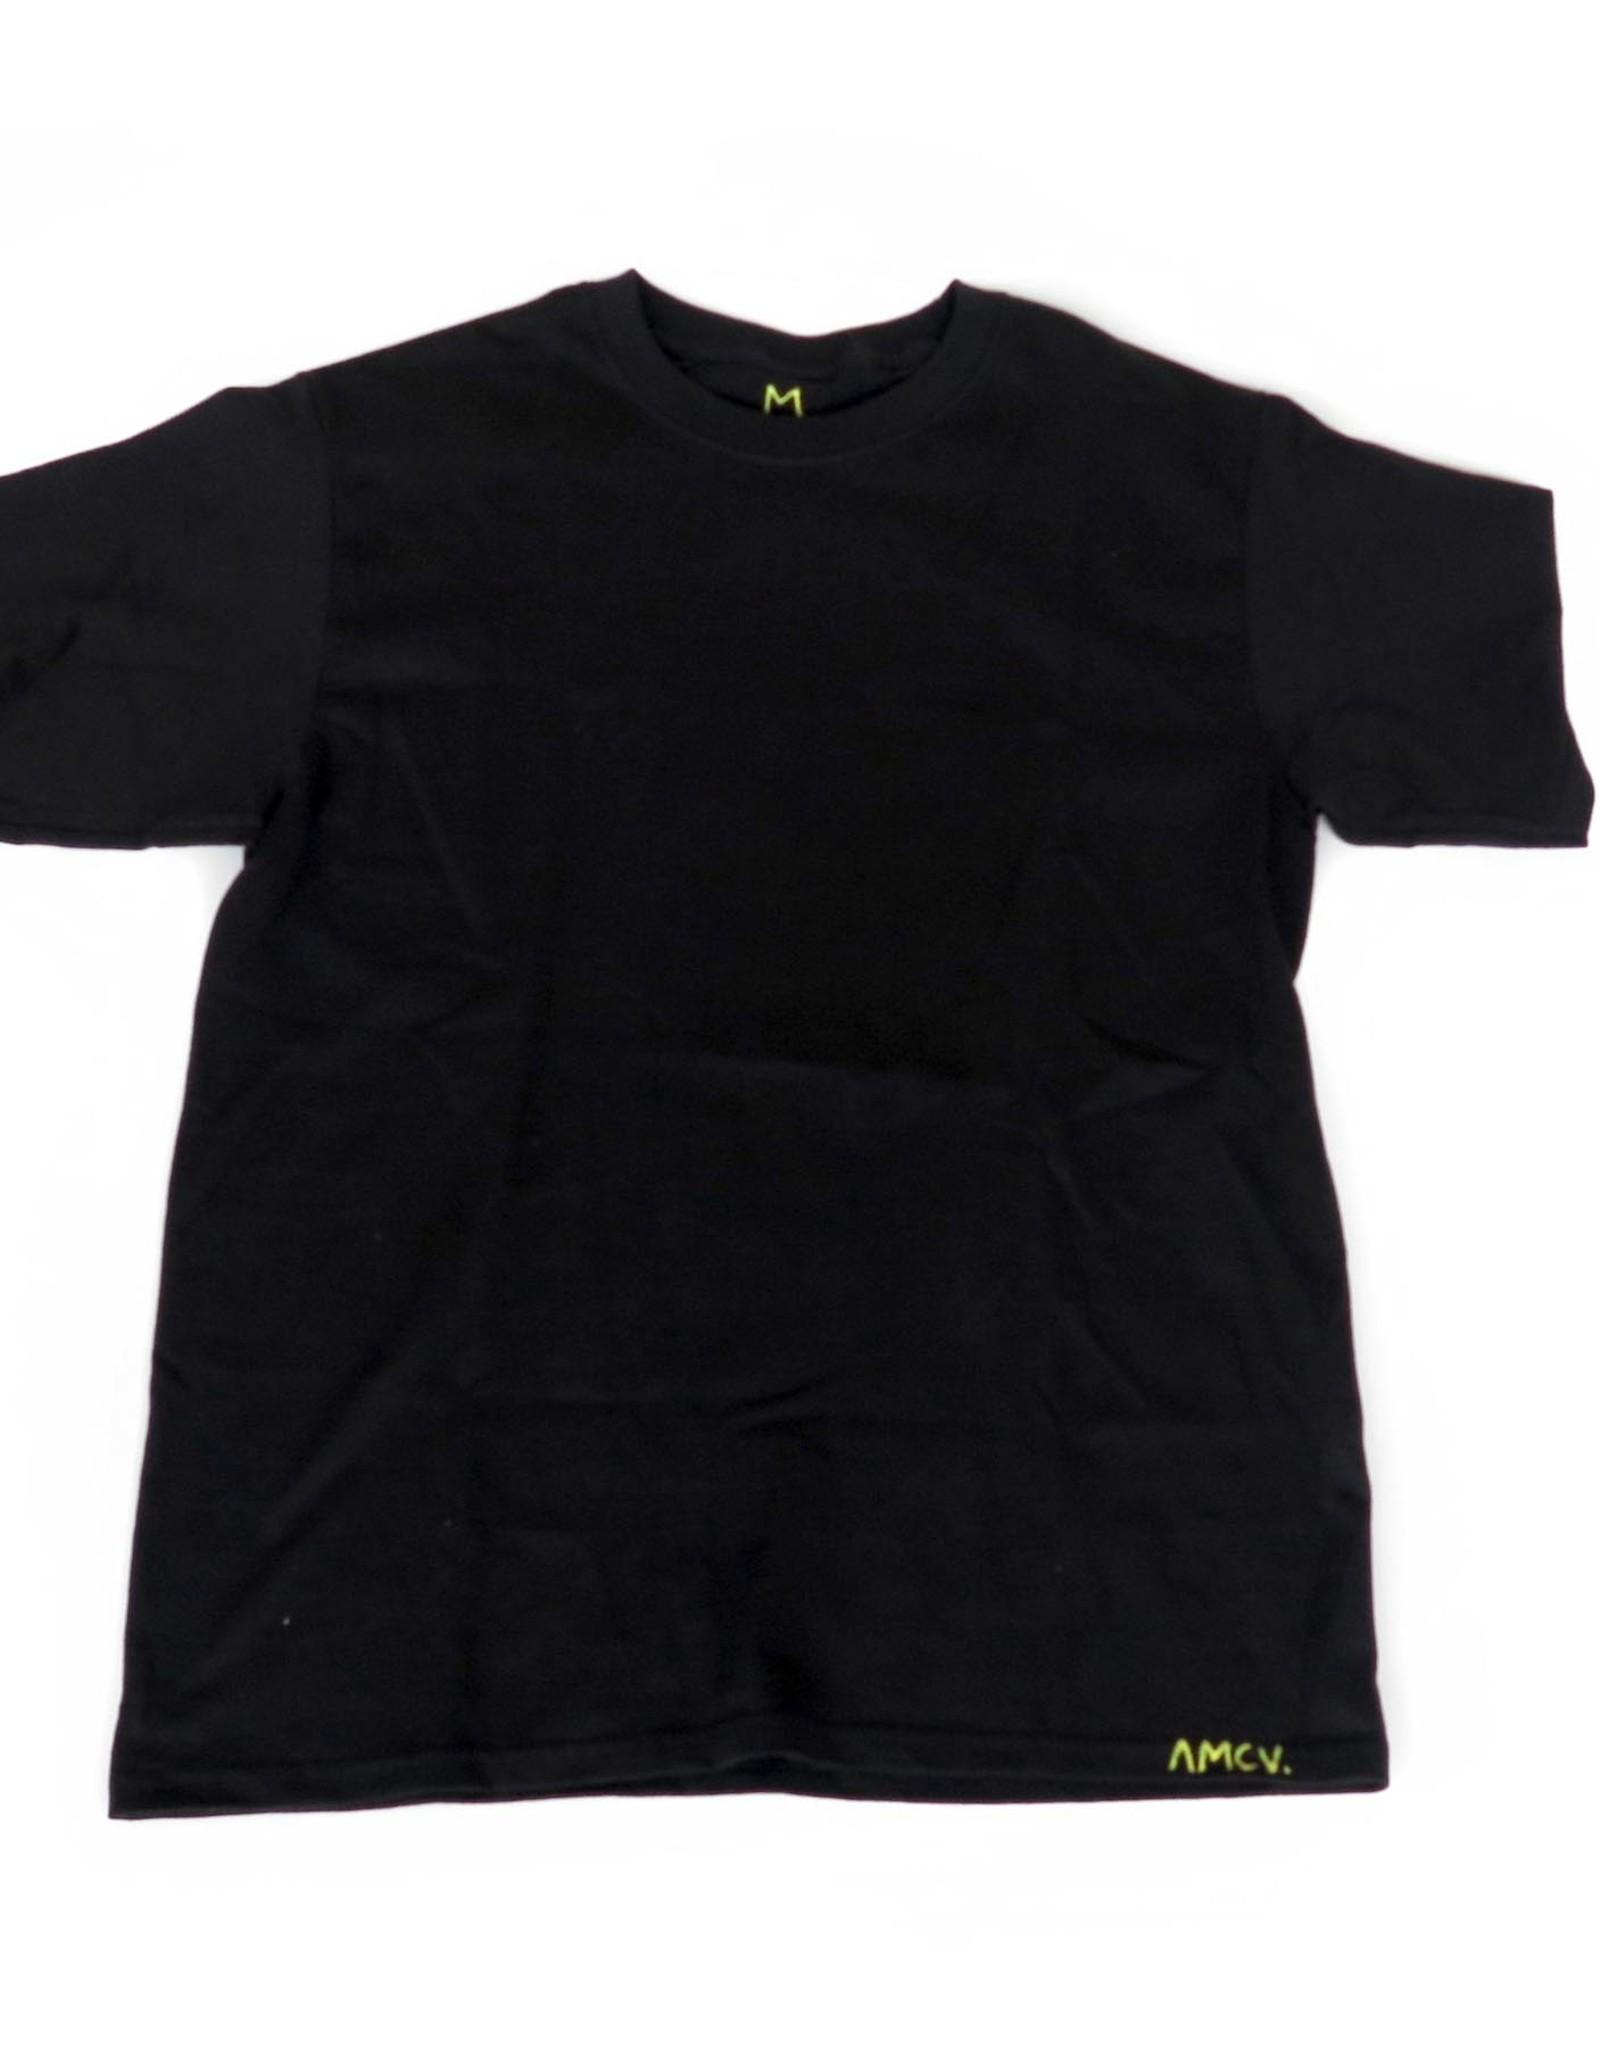 "AMCV ""Fuckin"" acrylic paint on black tshirt by AMCV"